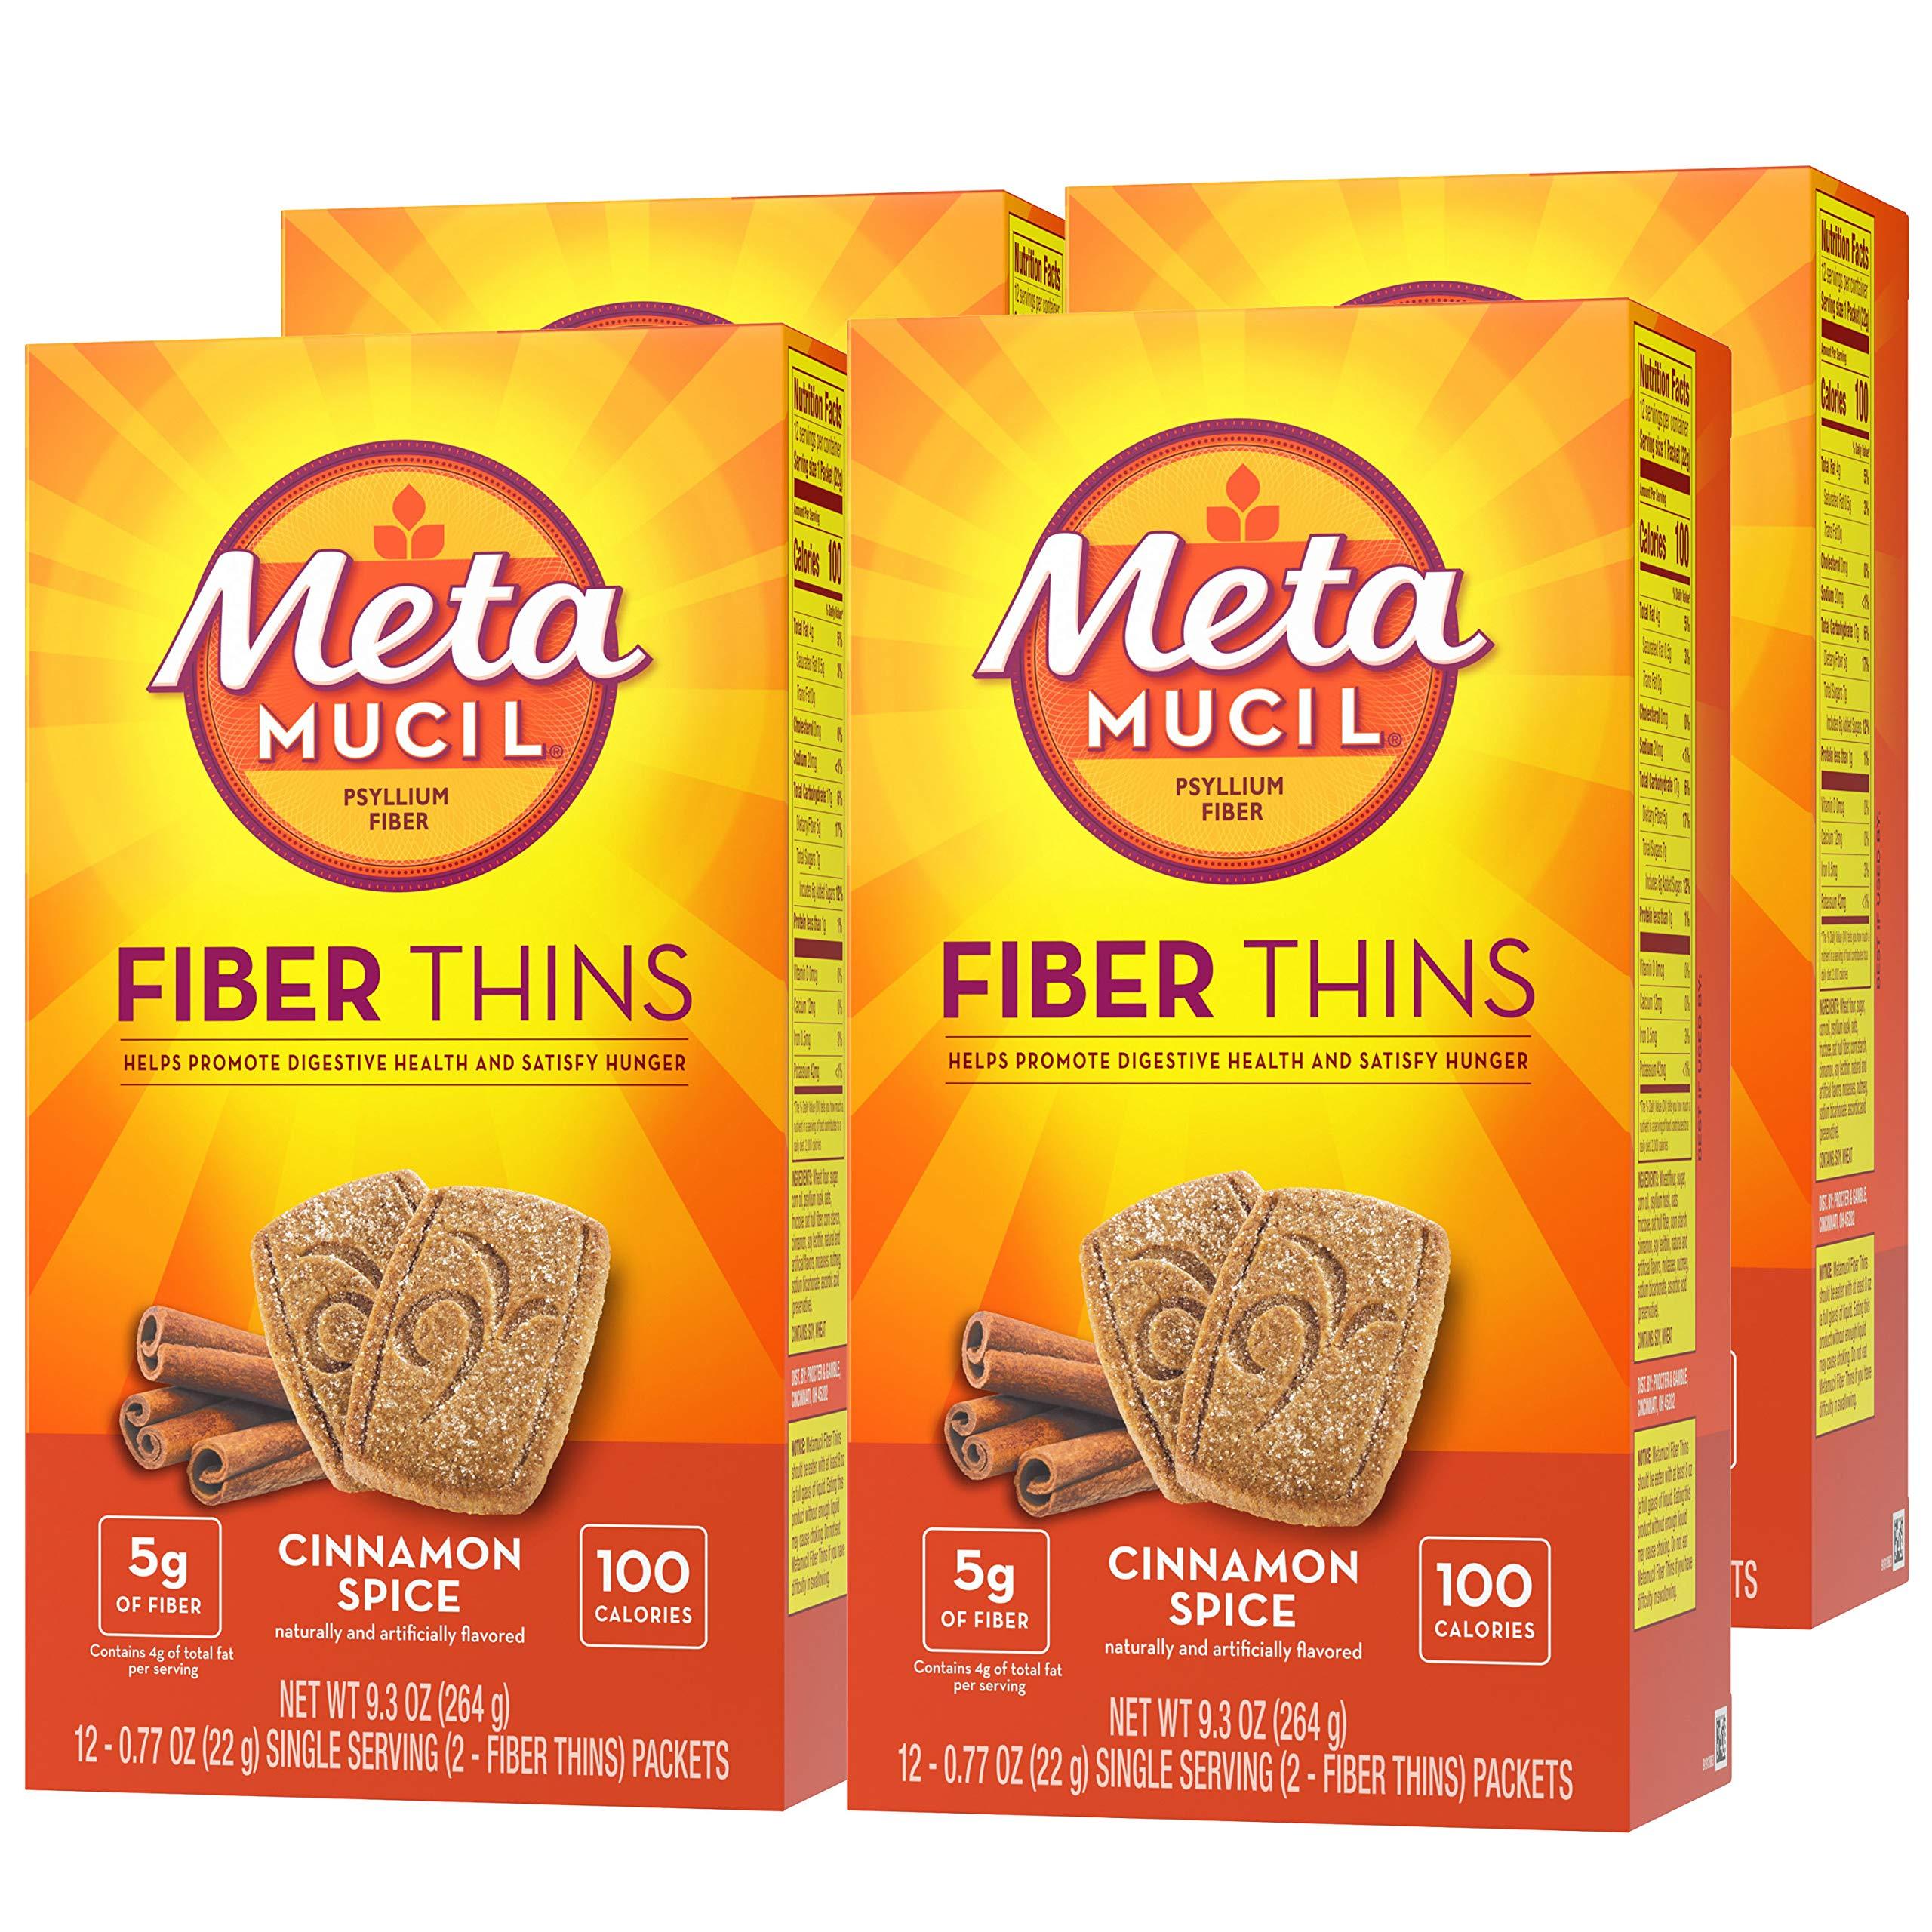 Metamucil Cinnamon Spice Flavored Fiber Thins Supplement with Psyllium Husk, 12 Servings (Pack of 4)